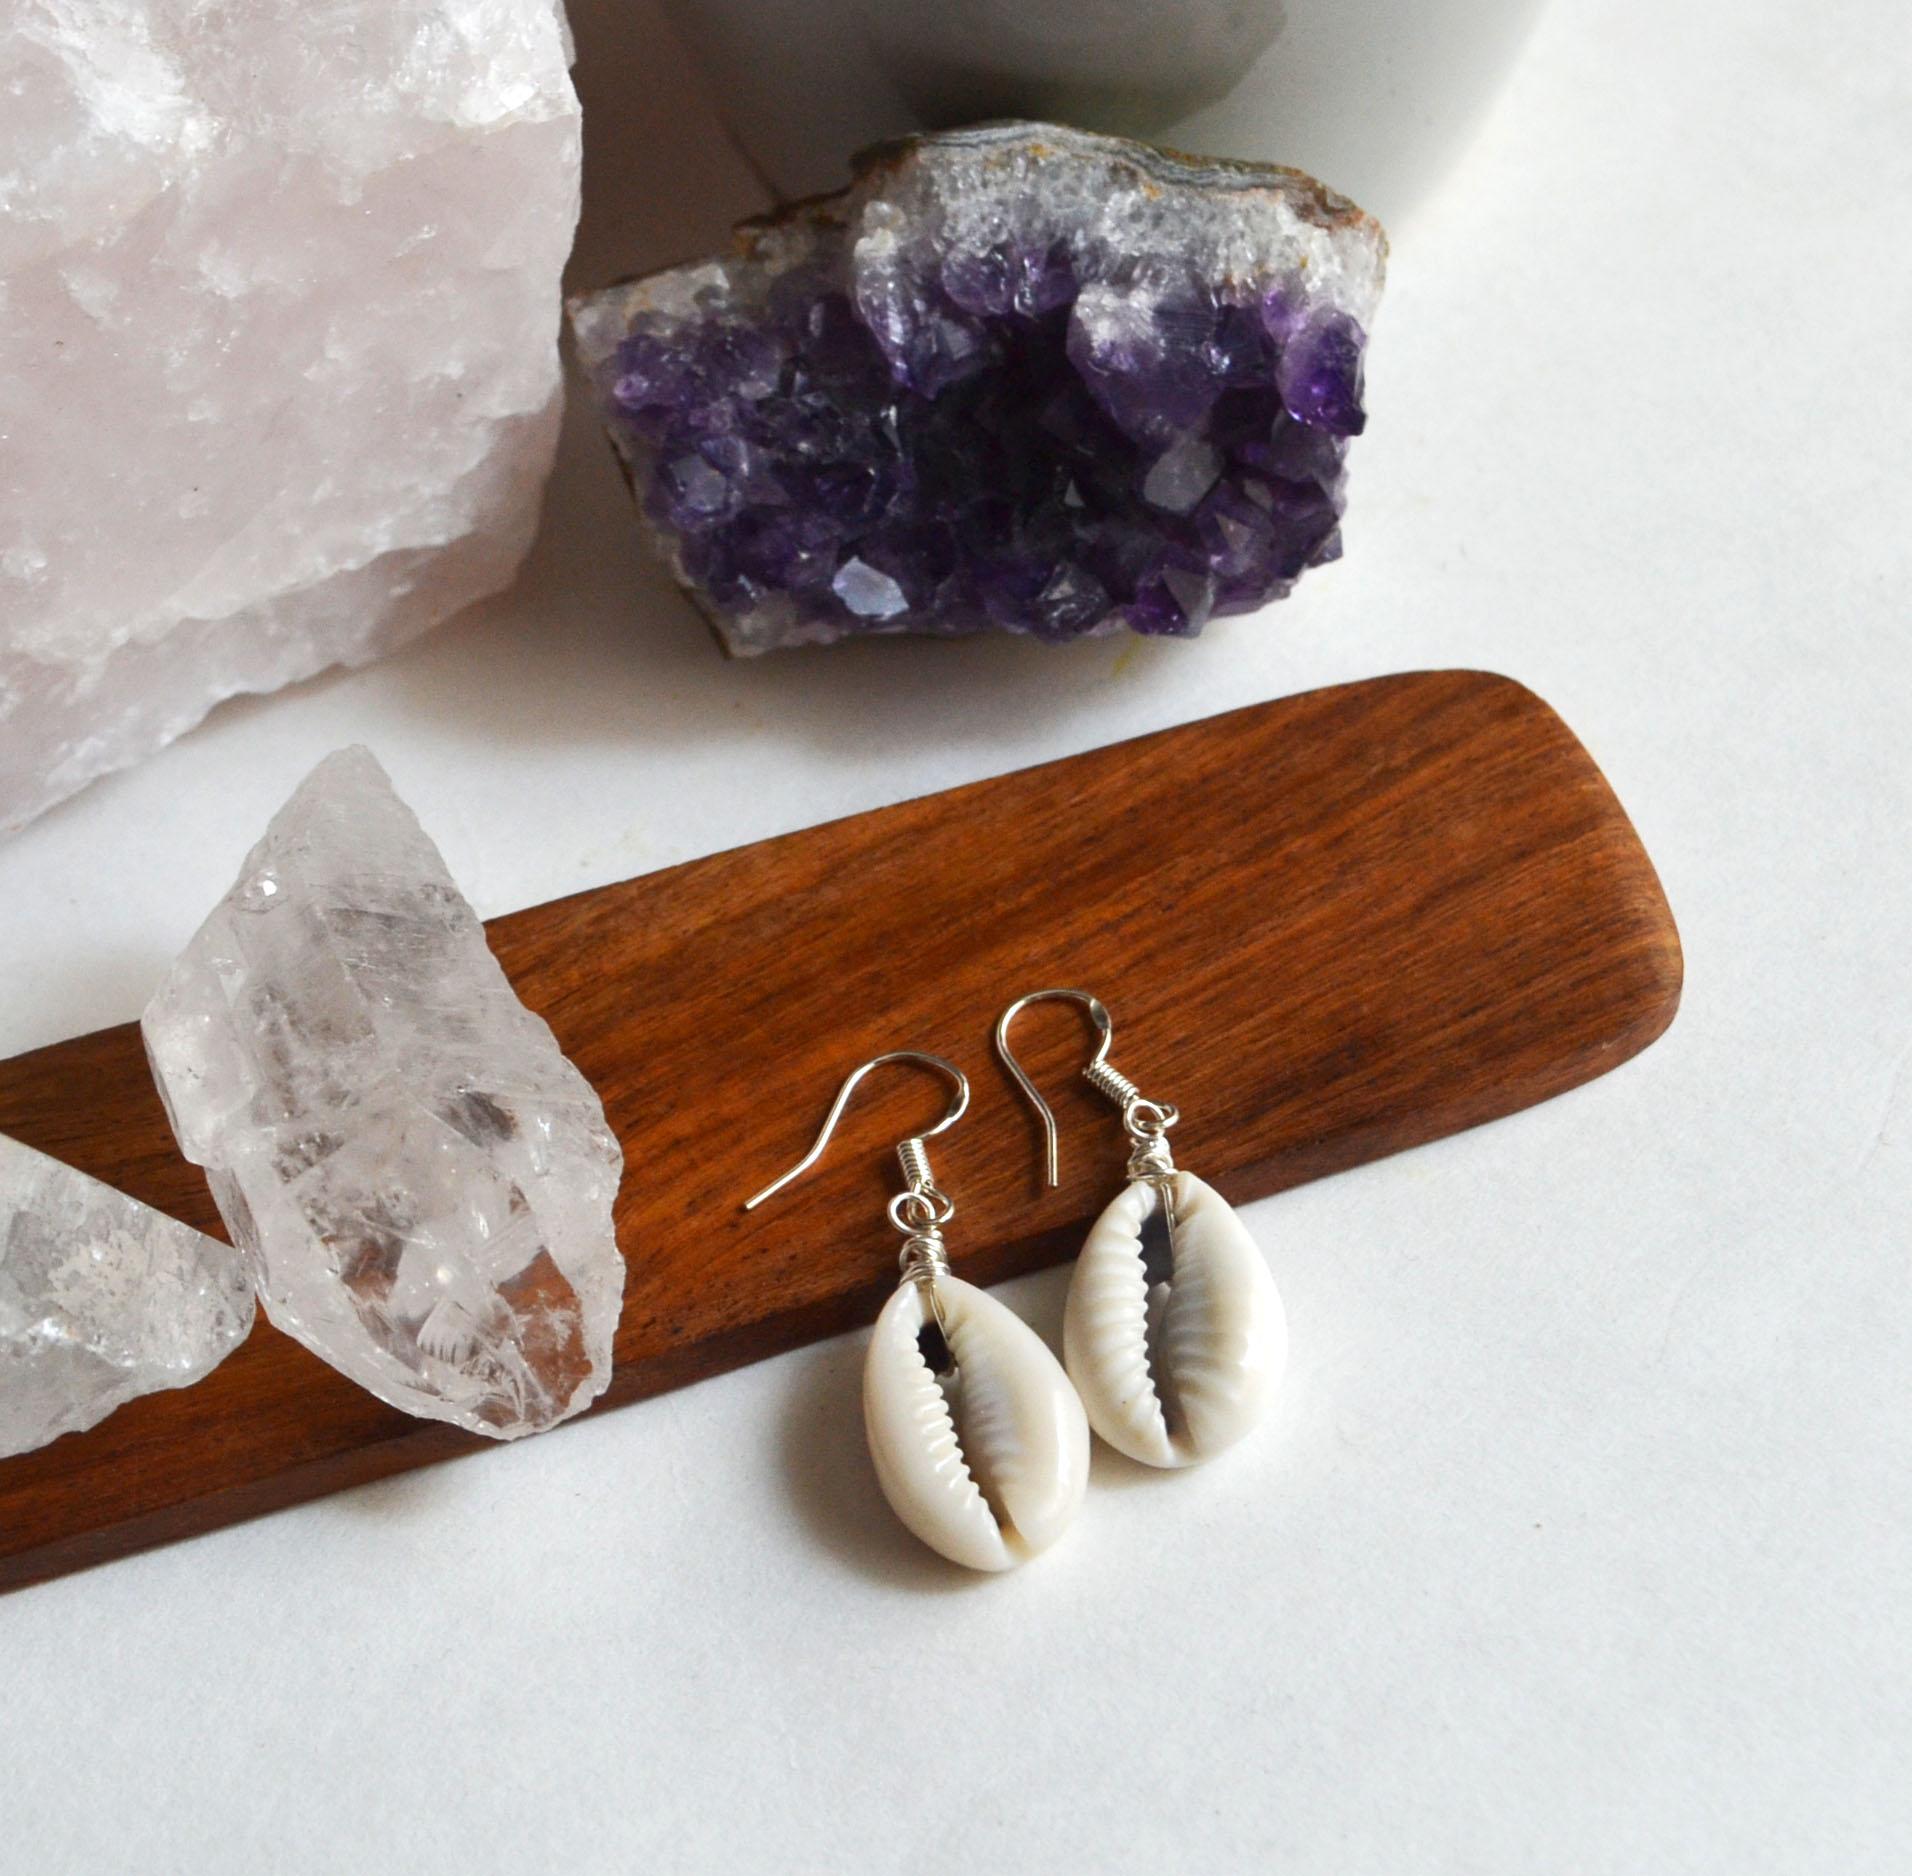 Cowrie Shell Earrings, Small Shell Earrings, Cowrie Shells, Beach  Earrings  Thumbnail 2